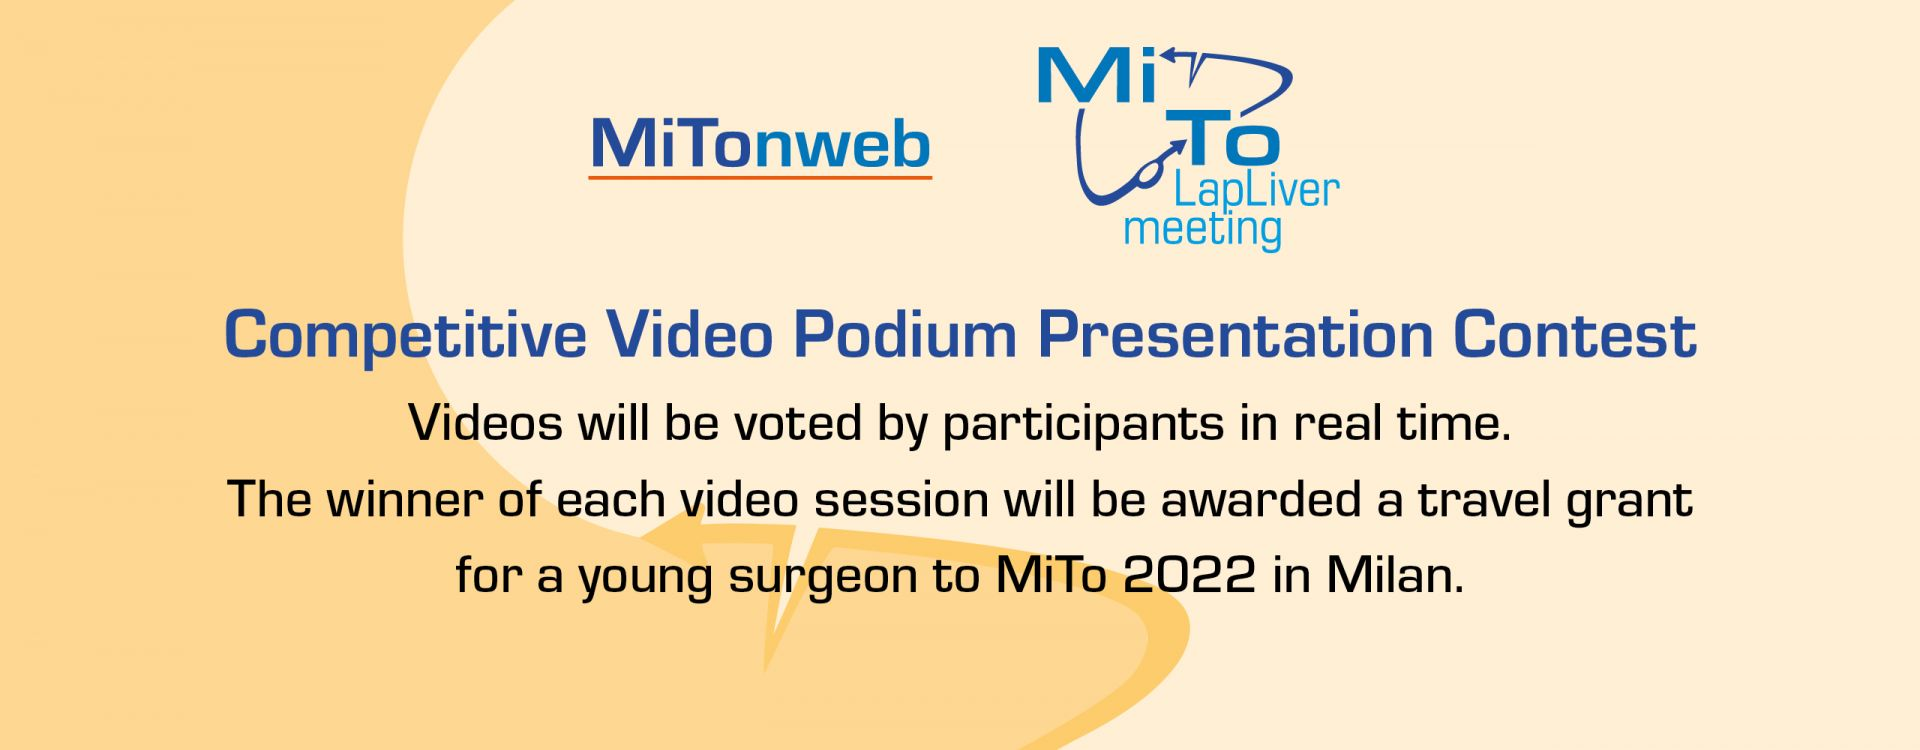 MITO LapLiver Meeting 2